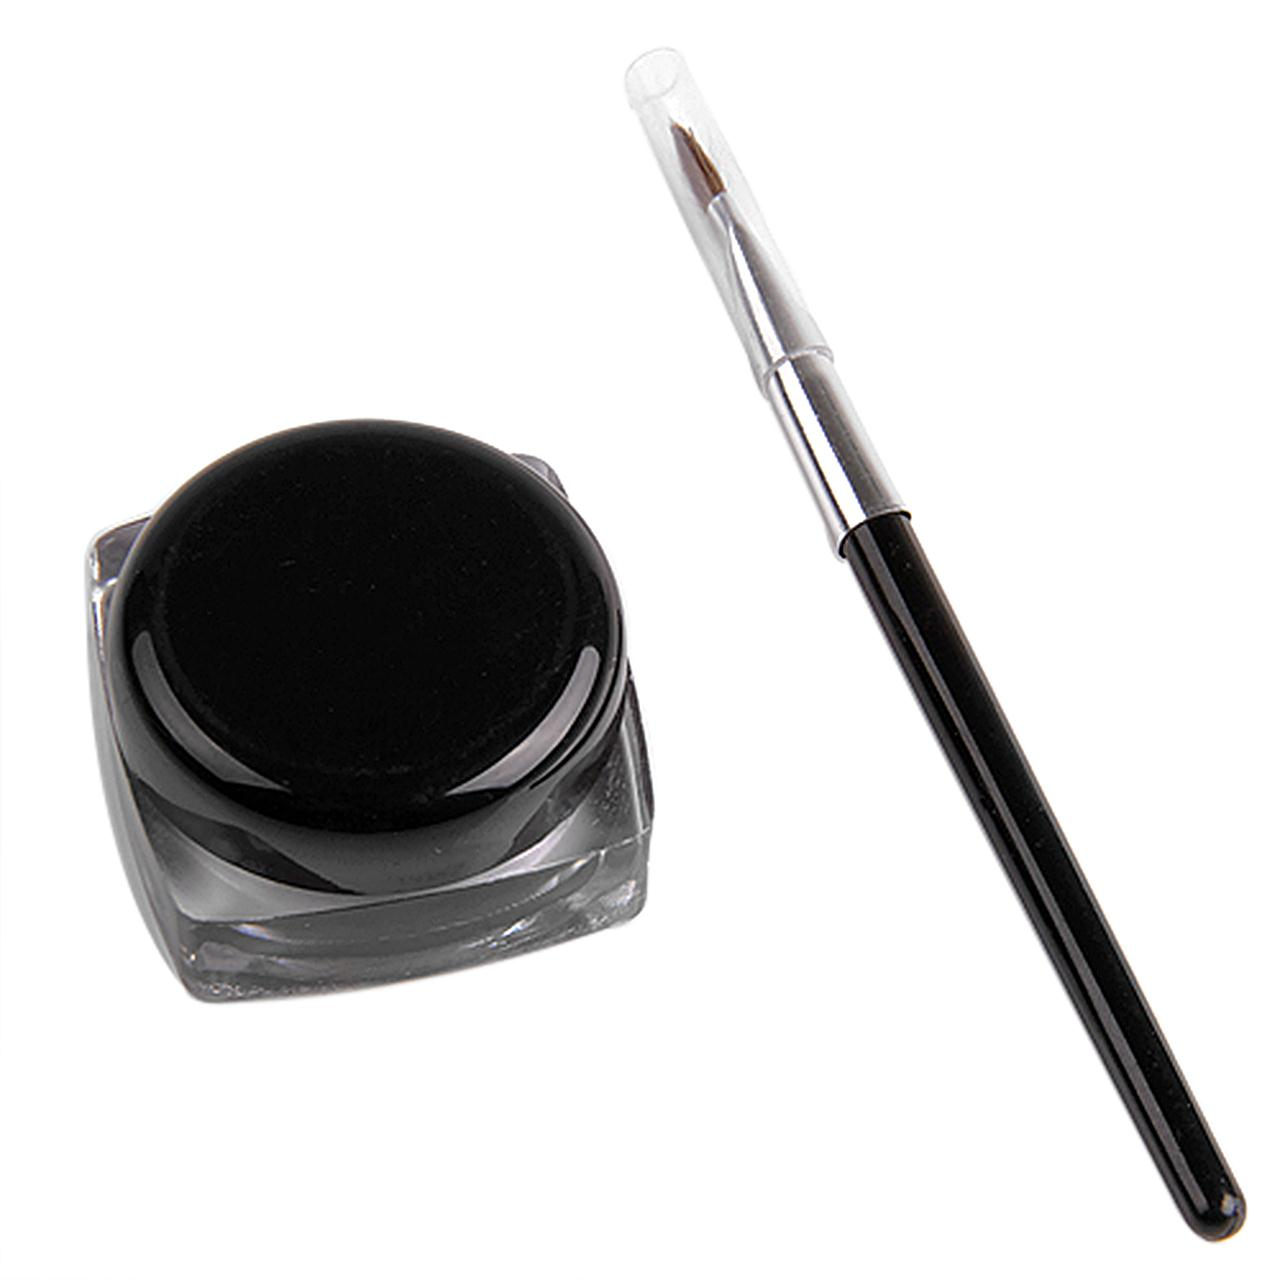 U-Pick-Eye-liner-Gel-12-pcs-Eye-Brow-Eye-Shadow-Eye-liner-Pencil-Make-Up-Tool